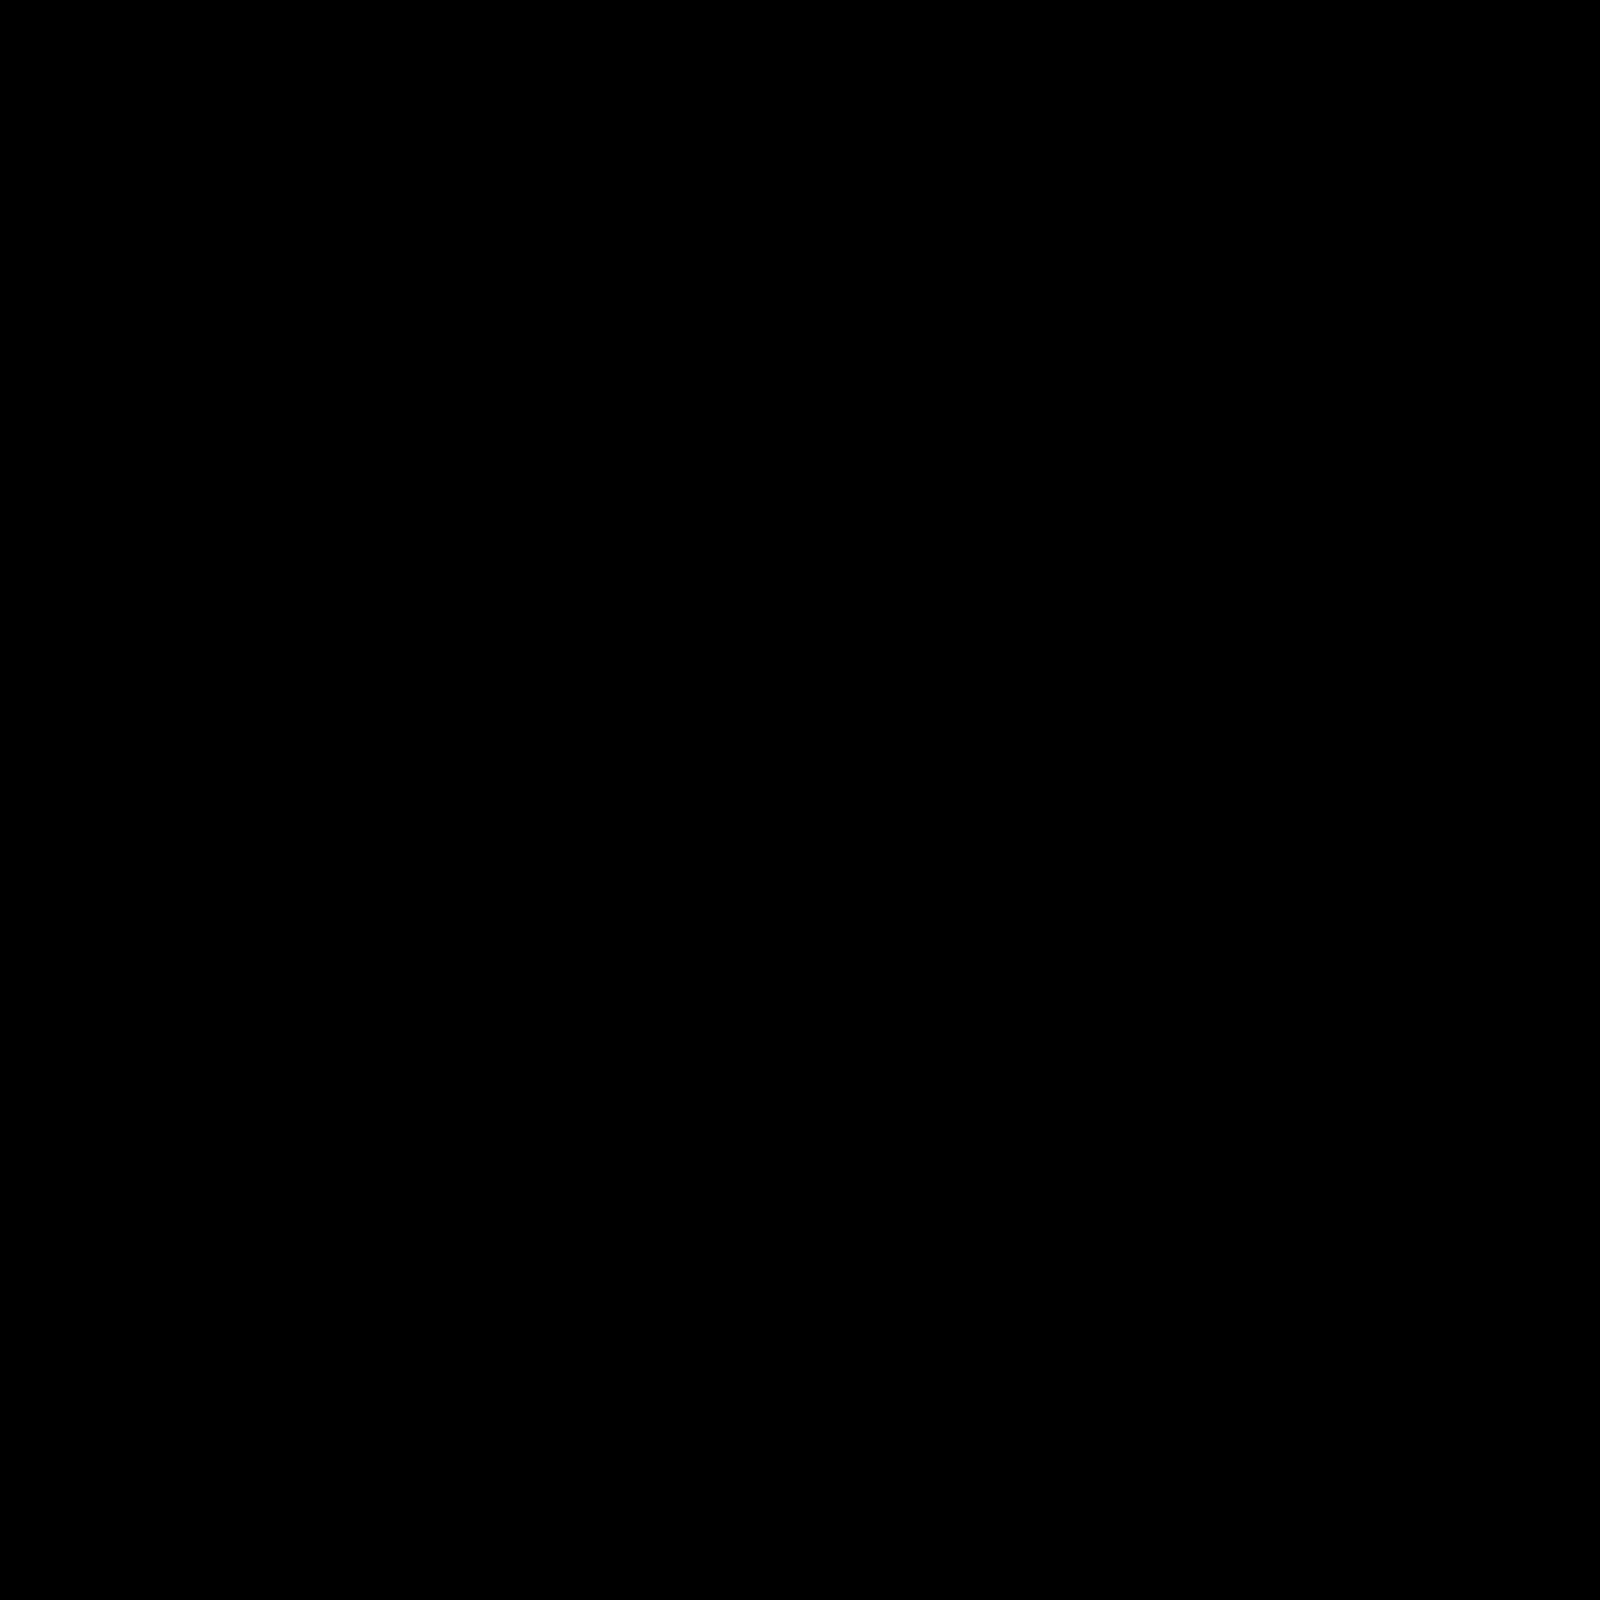 Tesla Model 3 icon